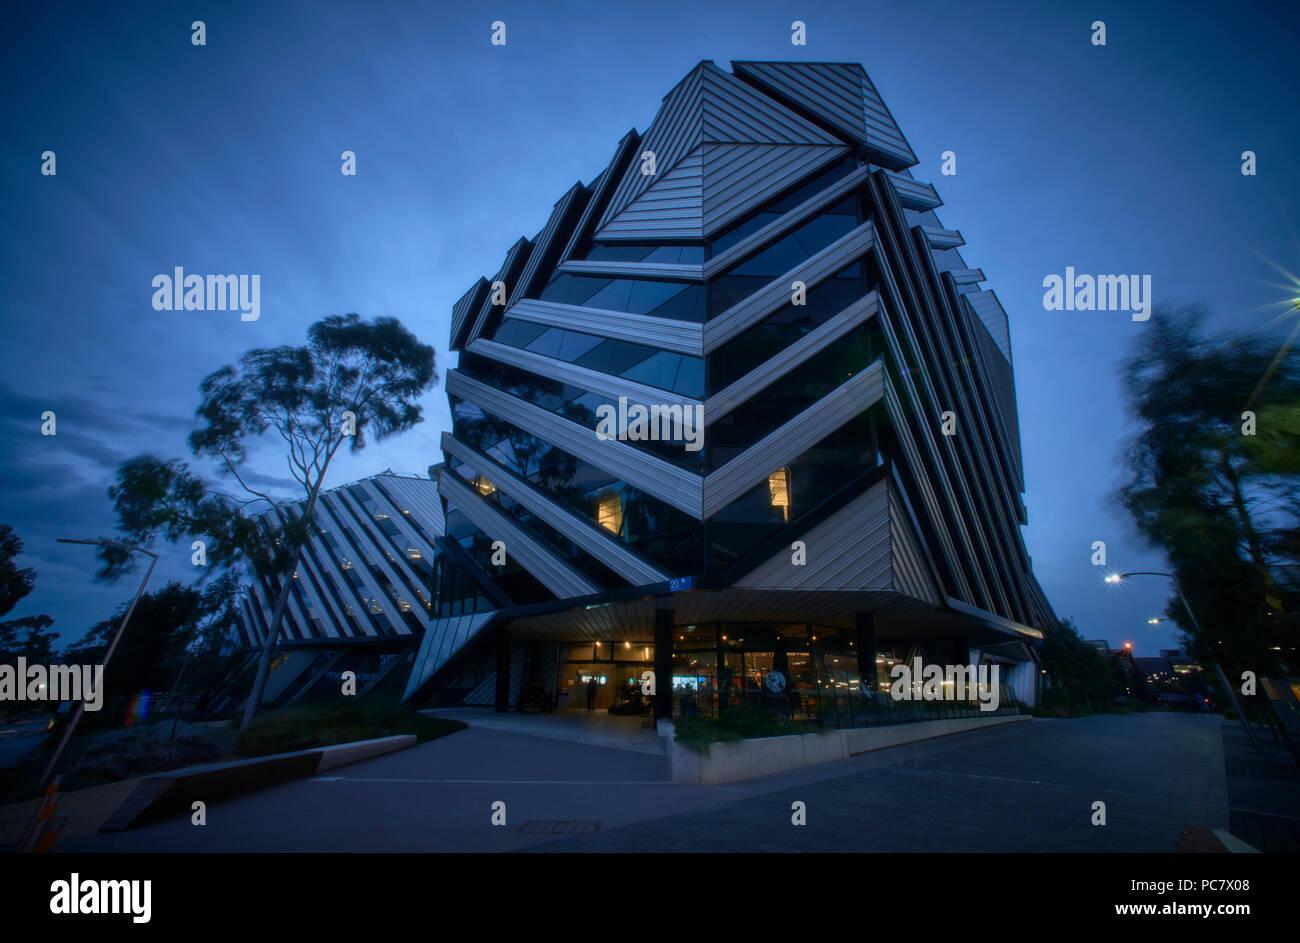 New Horizons  Research Centre, Monash University at night. - Stock Image